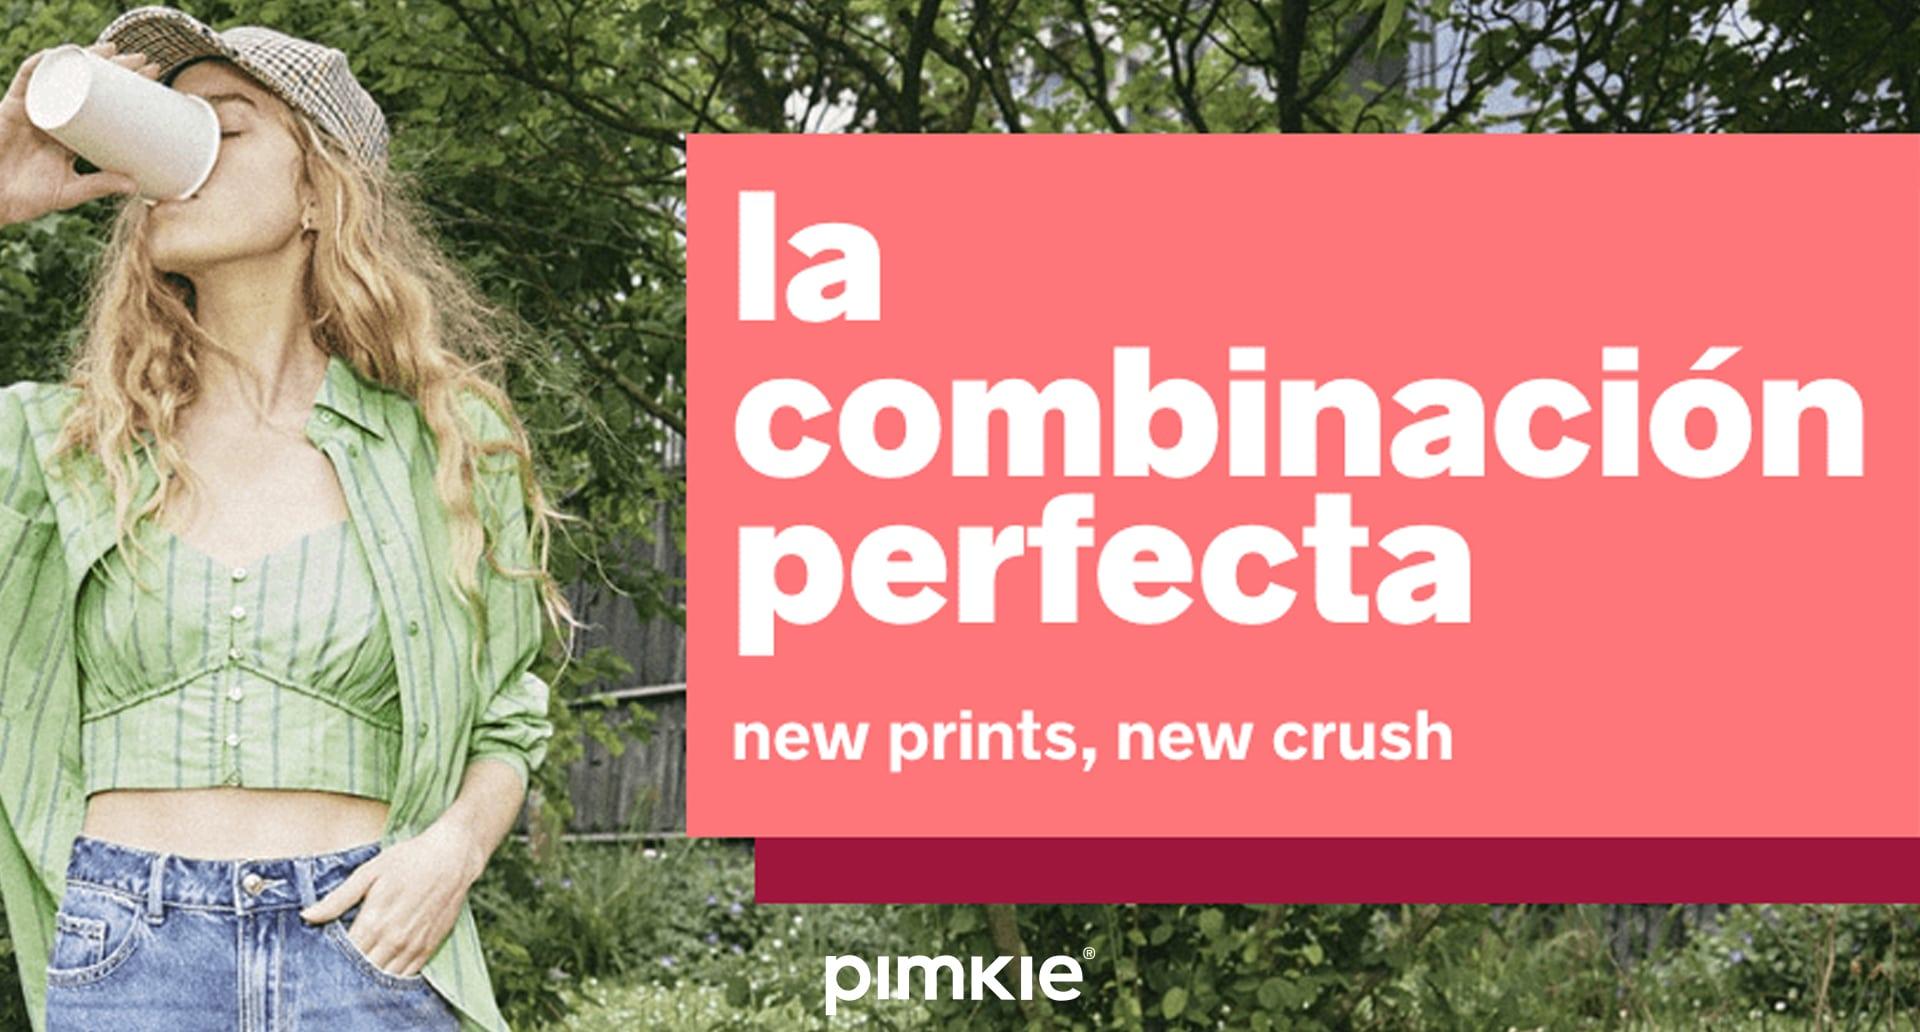 New prints, new crush